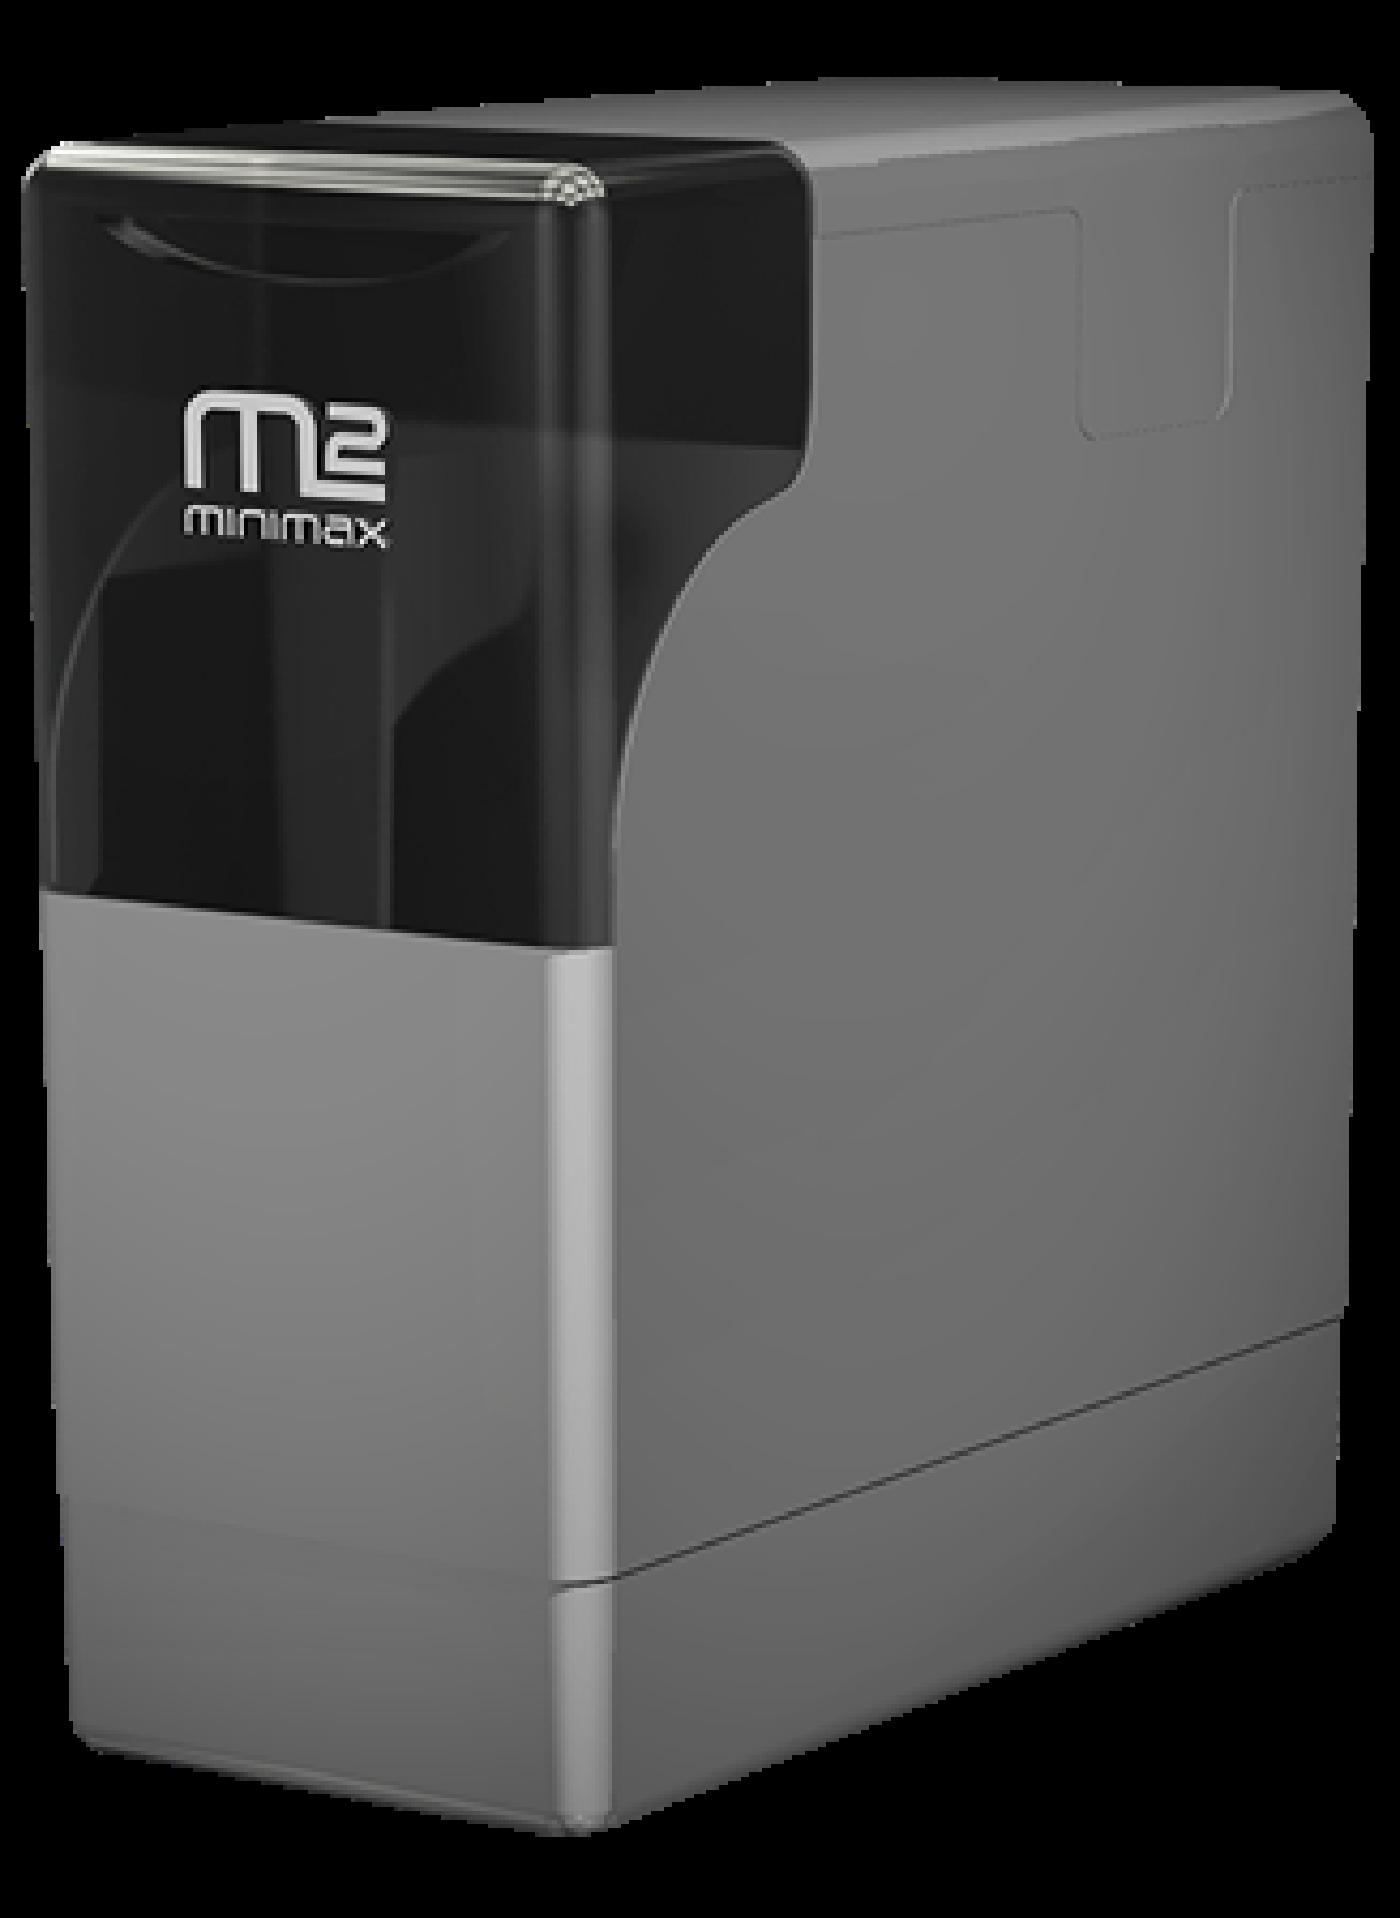 M2 Mini Max Water Softener Kemsing Water Softeners Sevenoaks